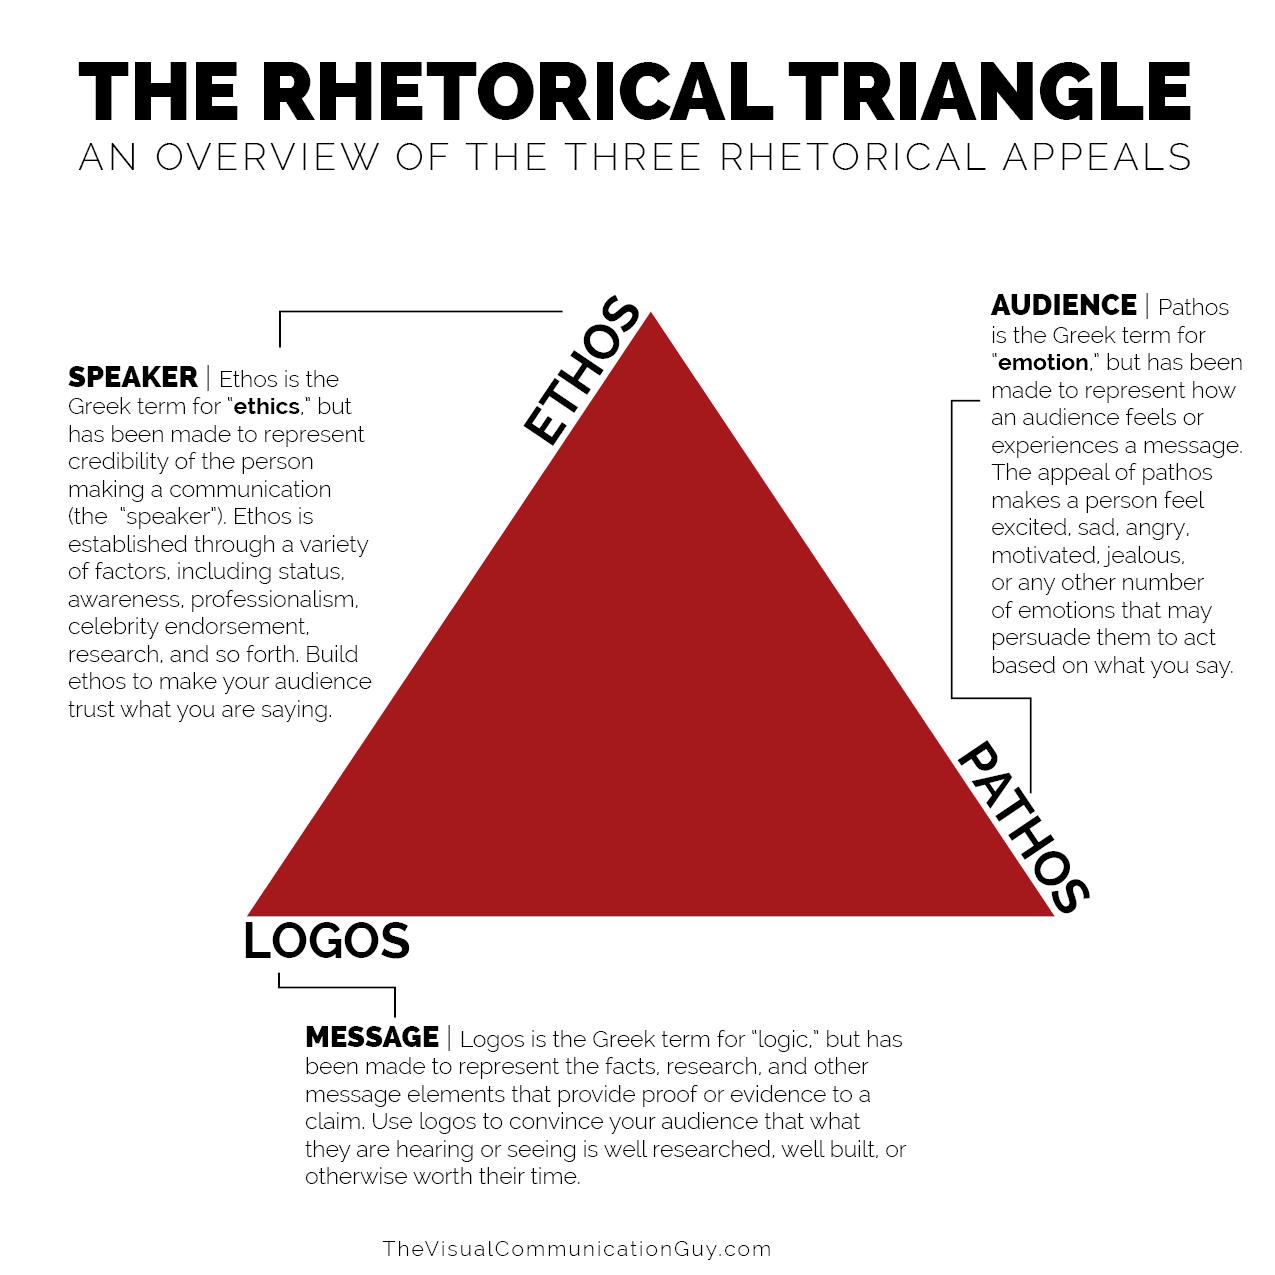 THE RHETORICAL APPEALS RHETORICAL TRIANGLE – The Visual